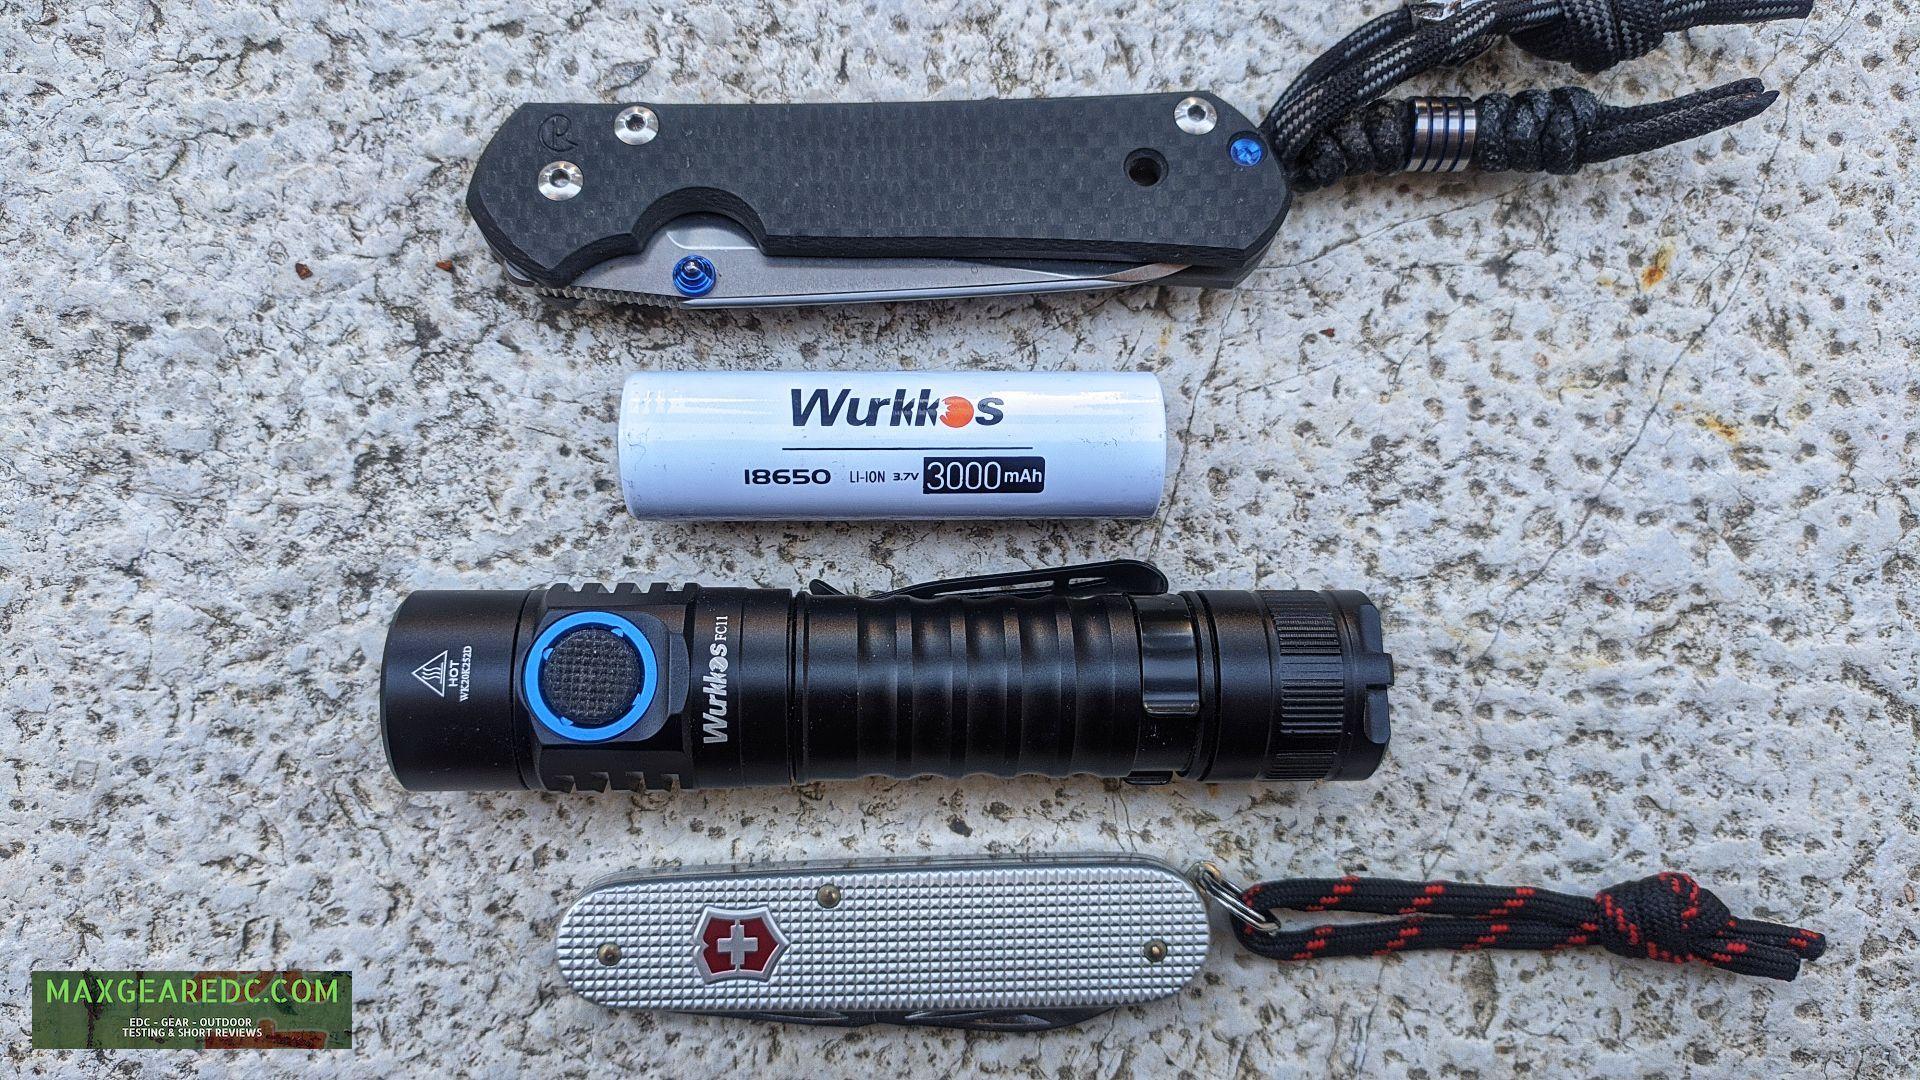 Wurkkos_FC11_EDC_Flashlight_Review_Aluminium_18650_maxgearedc.com_EDC_GEAR_OUTDOOR_TESTING_and_SHORT_REVIEWS_14